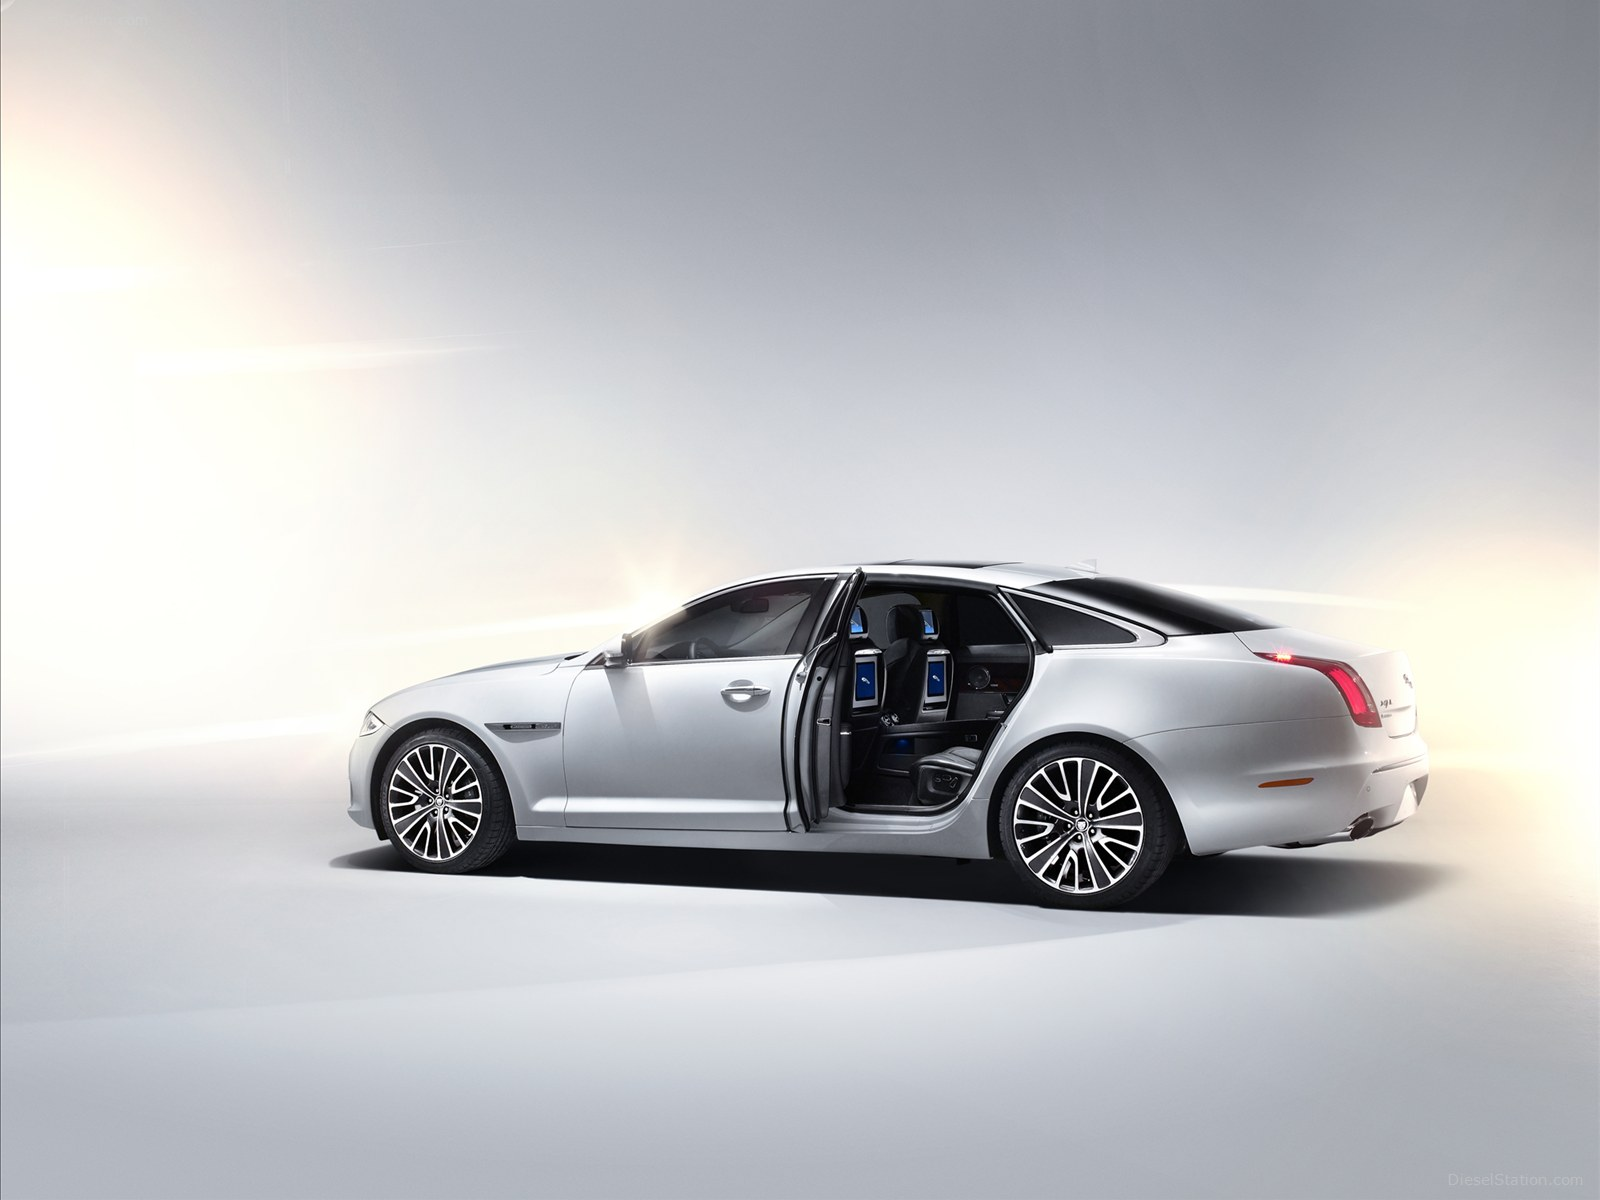 Jaguar Xj 2015 Images Gallery Cars 2015 Pics Hub